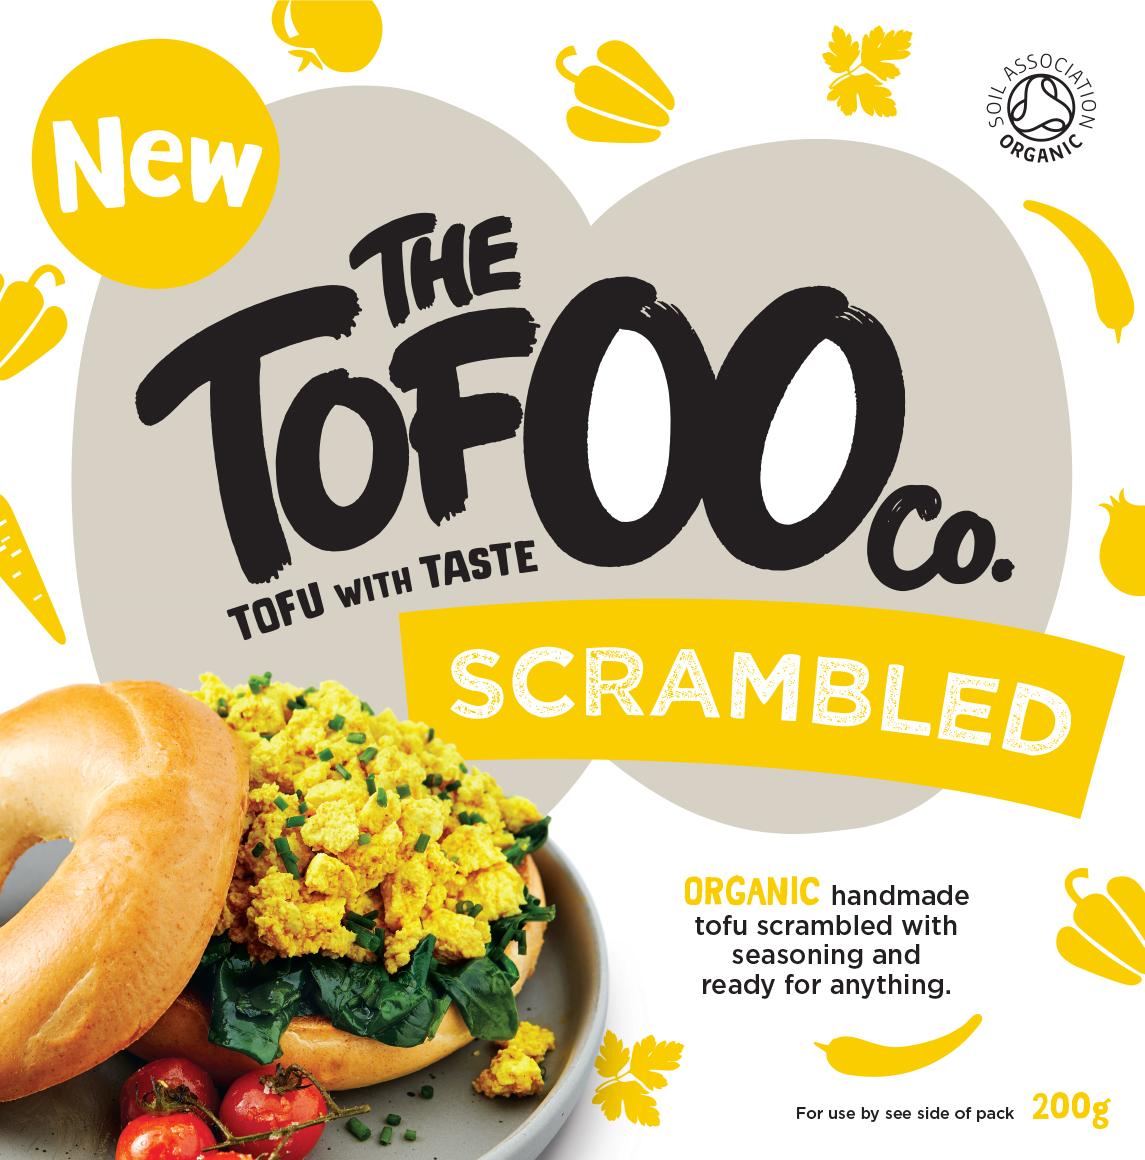 Tofoo Scrambled